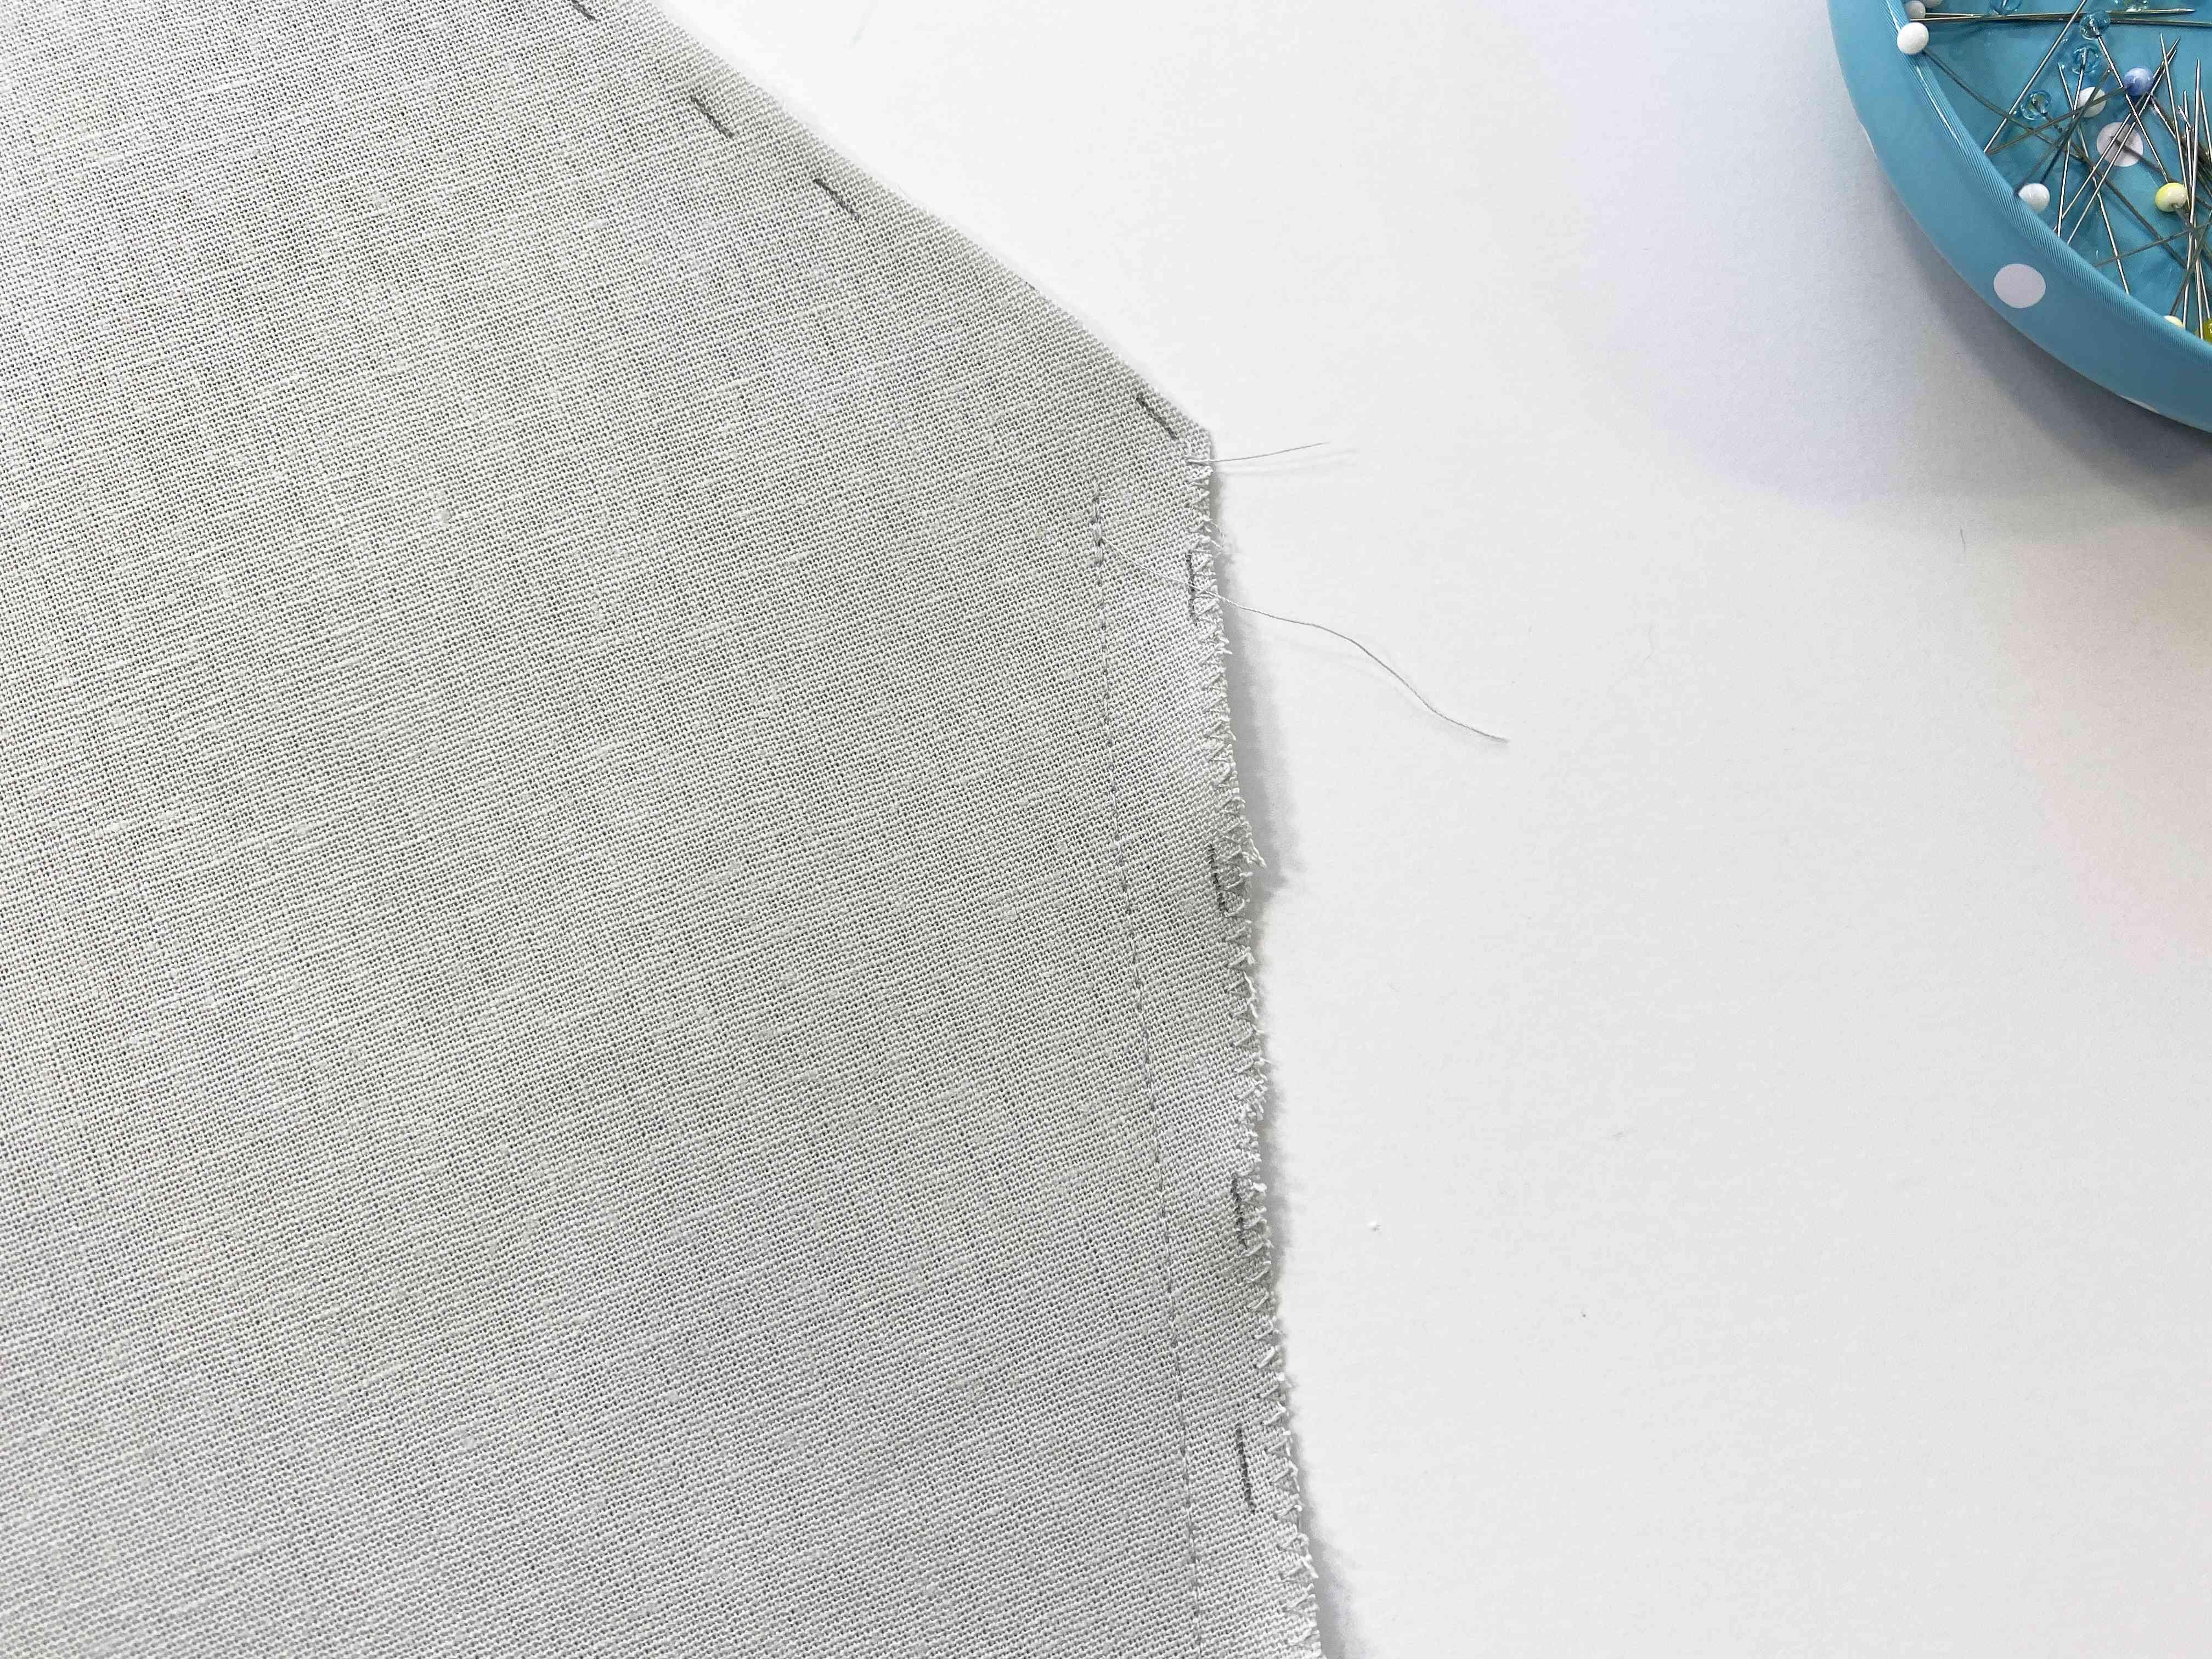 A sewn side seam